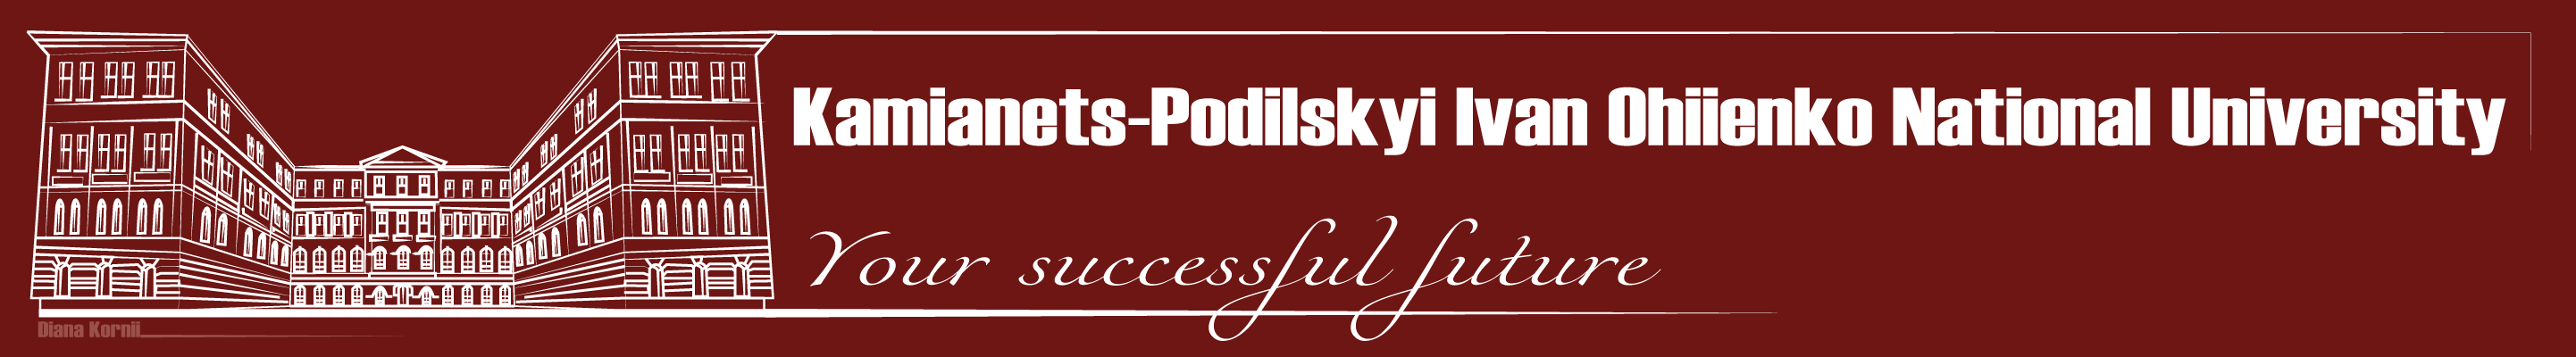 Kamianets-Podіlskyi National Ivan Ohiienko University